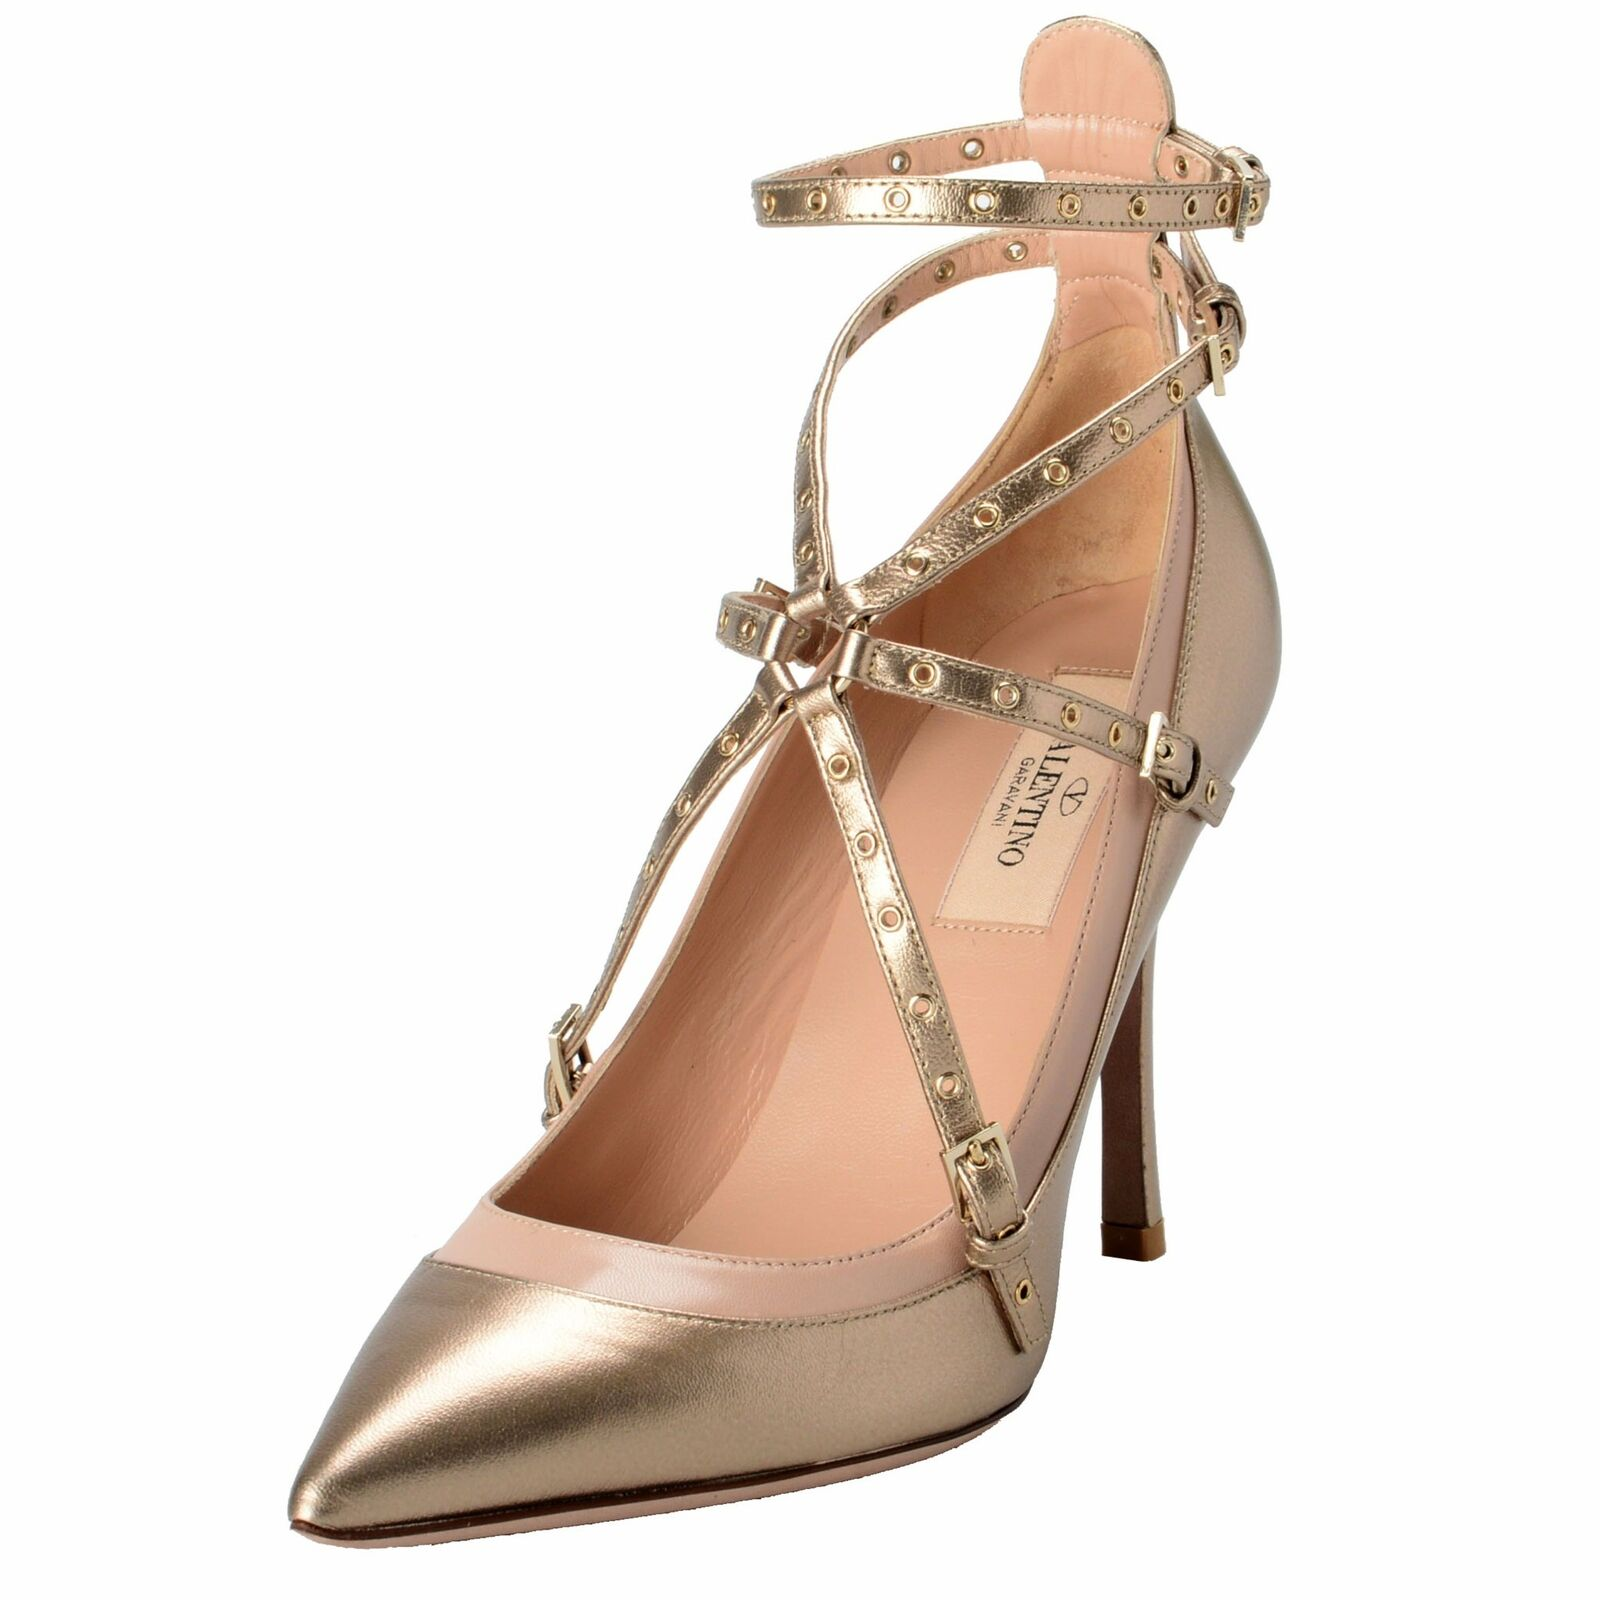 Valentino Garavani Women's Leather golden Ankle Strap High Heels shoes